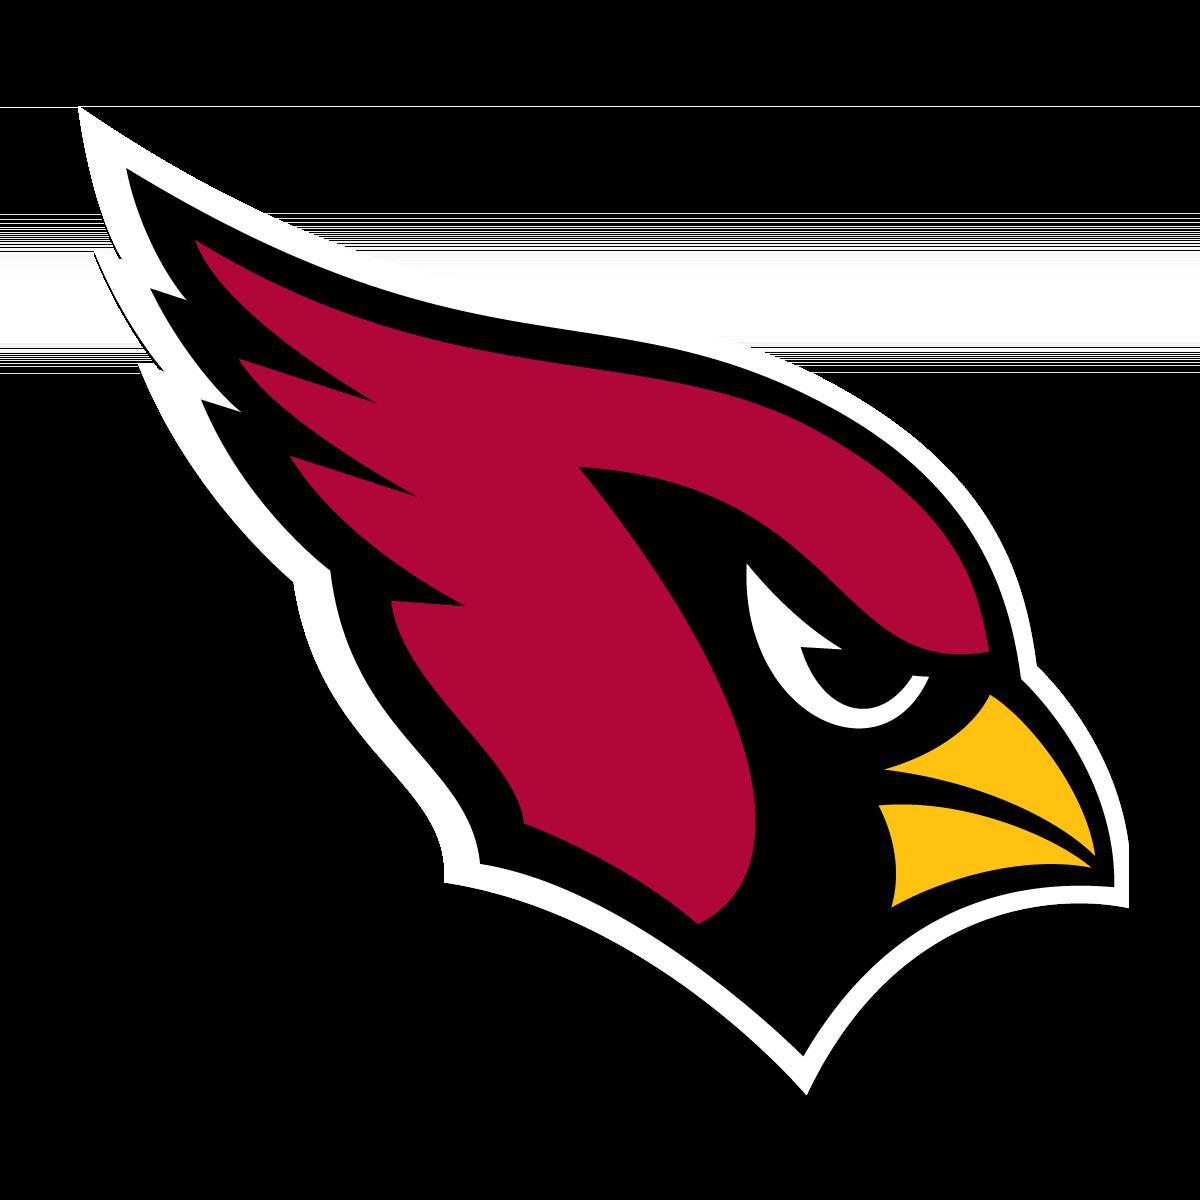 Receiver clipart arizona cardinals #1